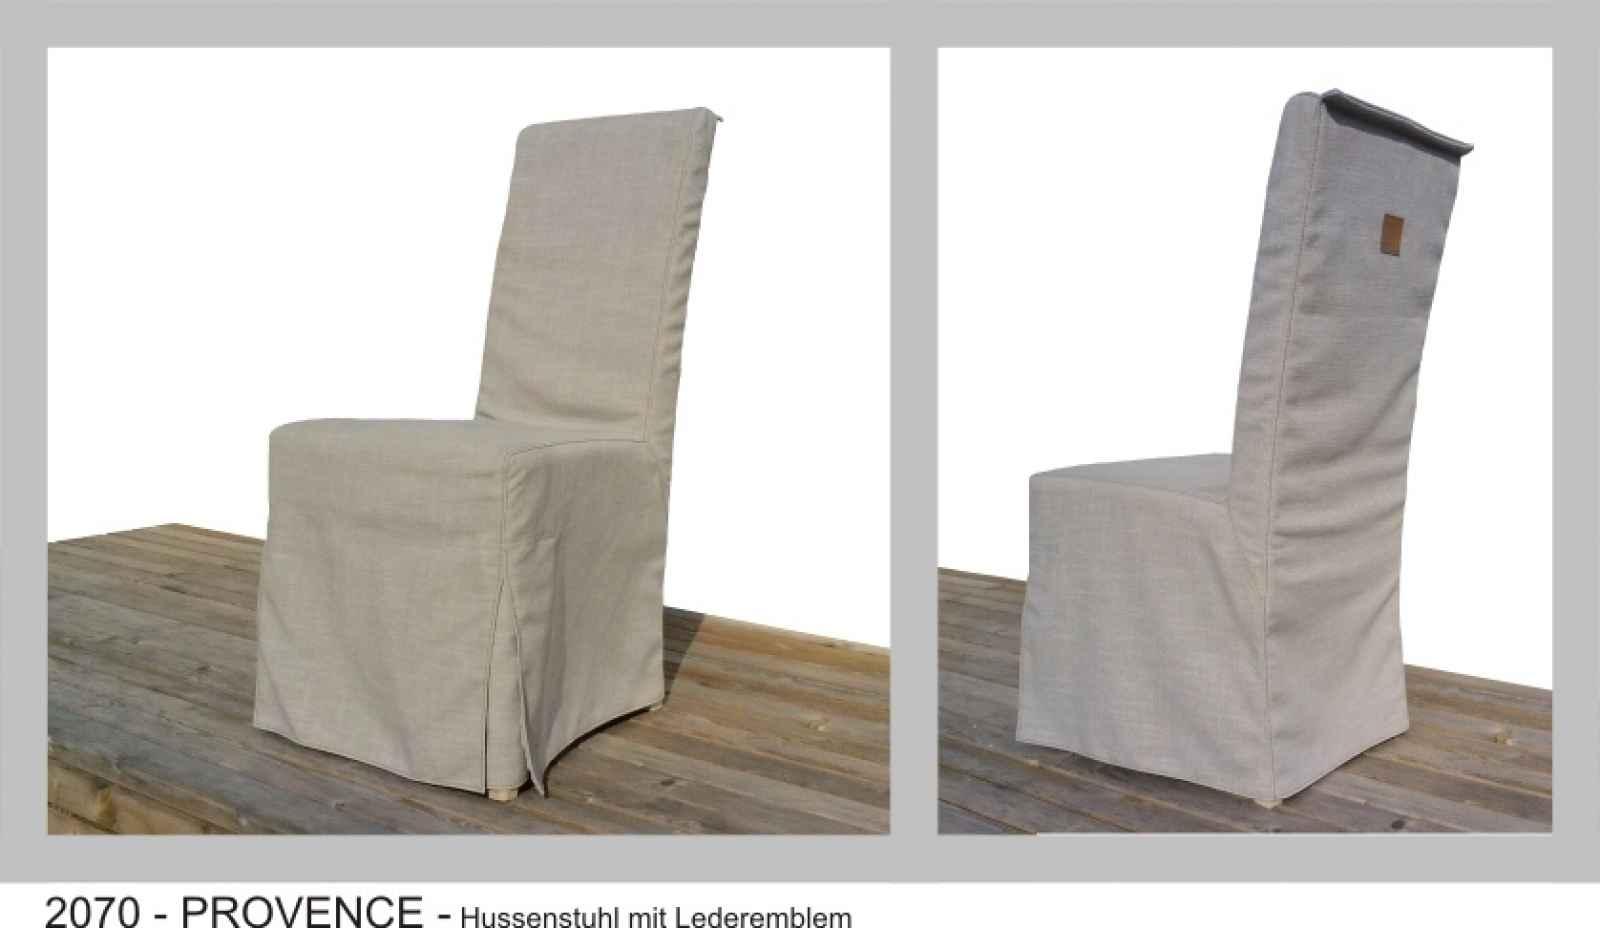 einzelsessel und einzelteile the lounge company. Black Bedroom Furniture Sets. Home Design Ideas